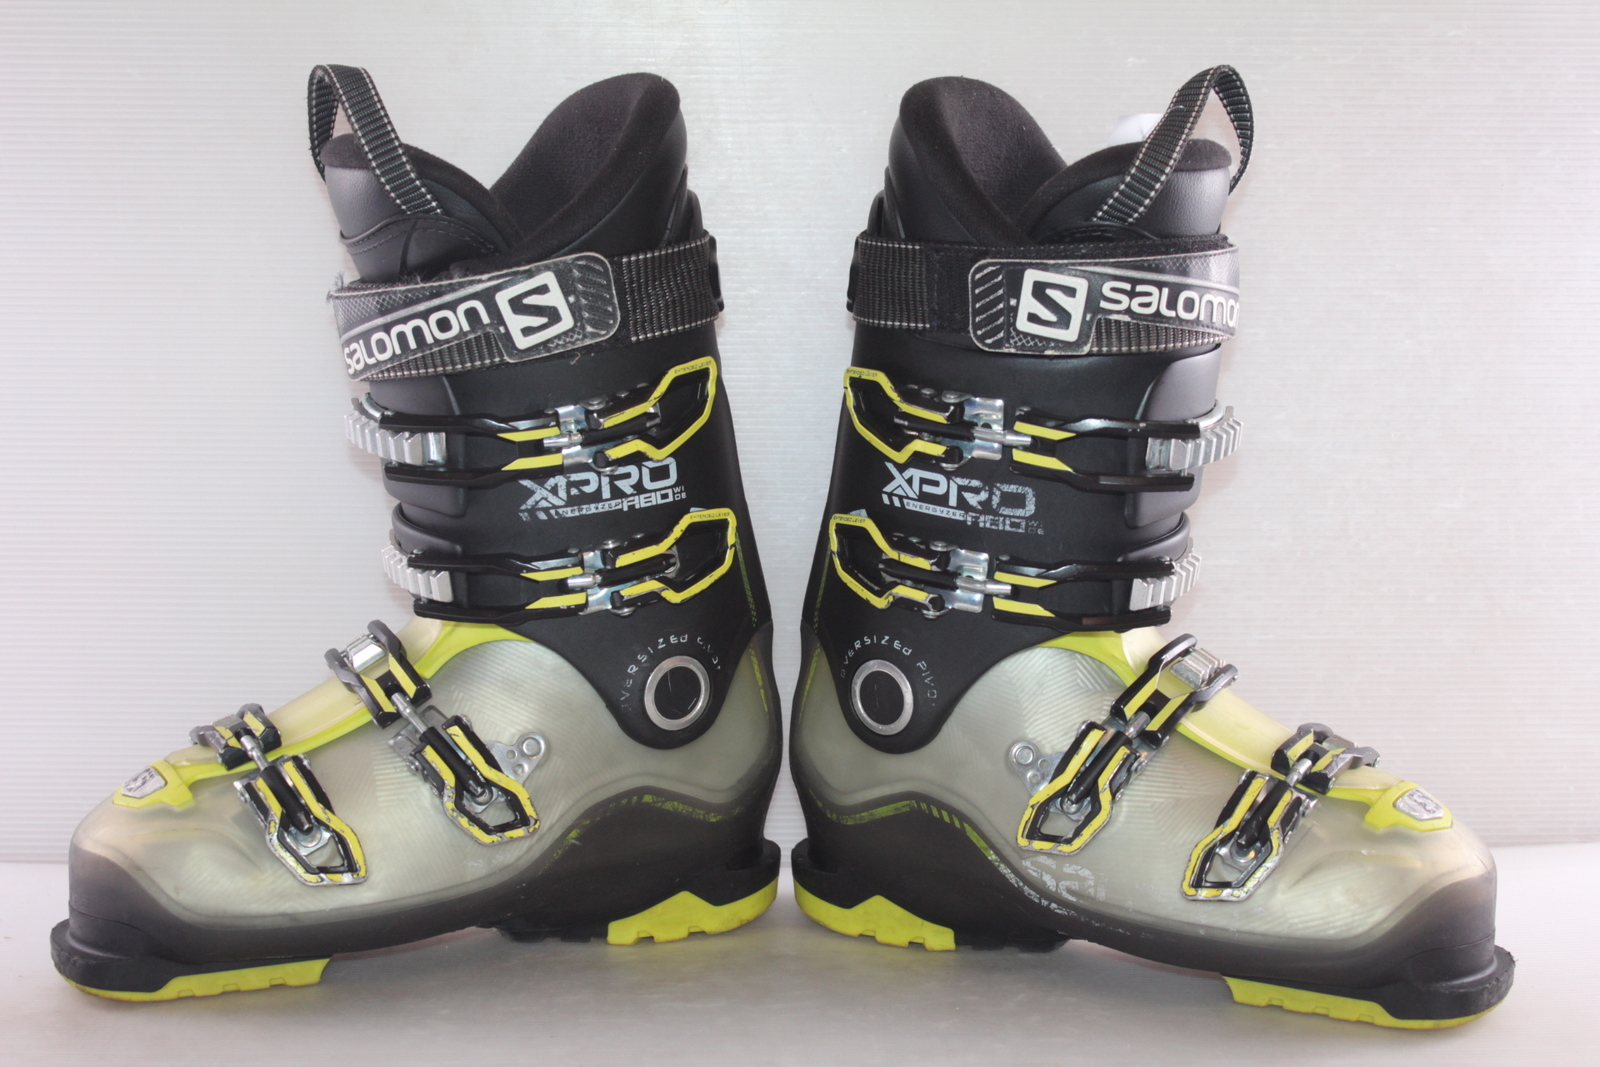 Lyžařské boty Salomon X Pro R80 W wide vel. EU40.5 flexe 80